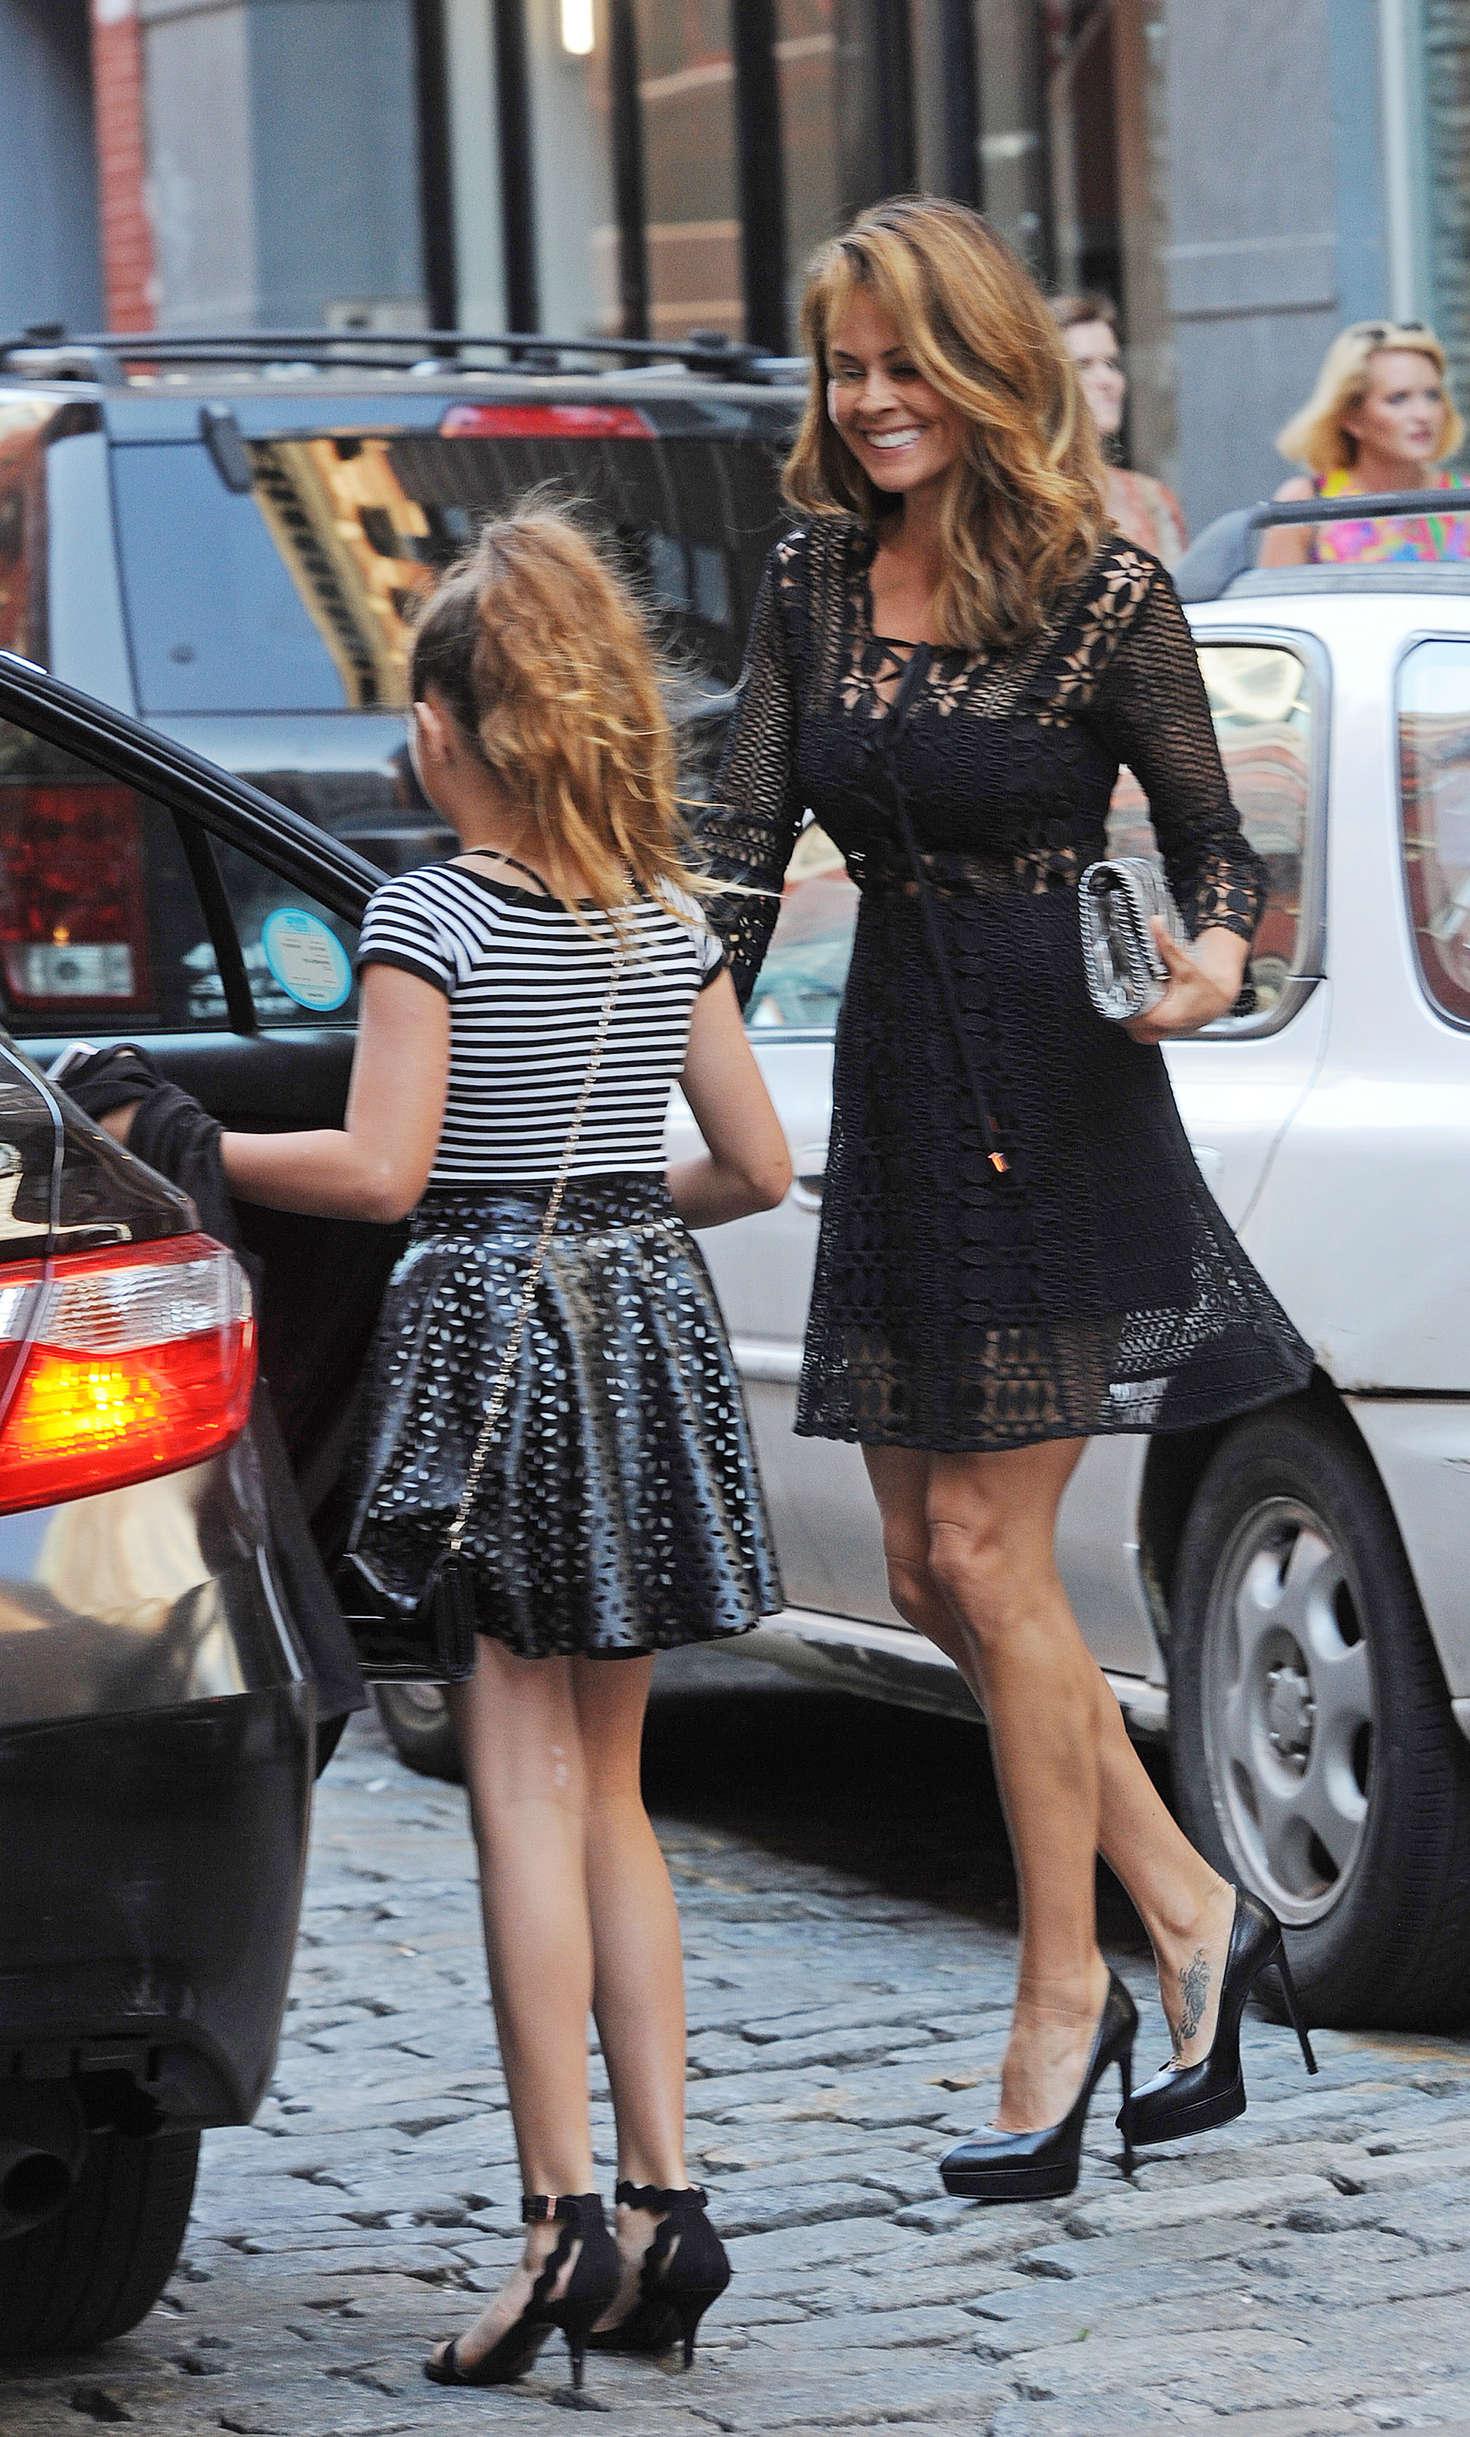 brooke burke in black mini dress 18 gotceleb